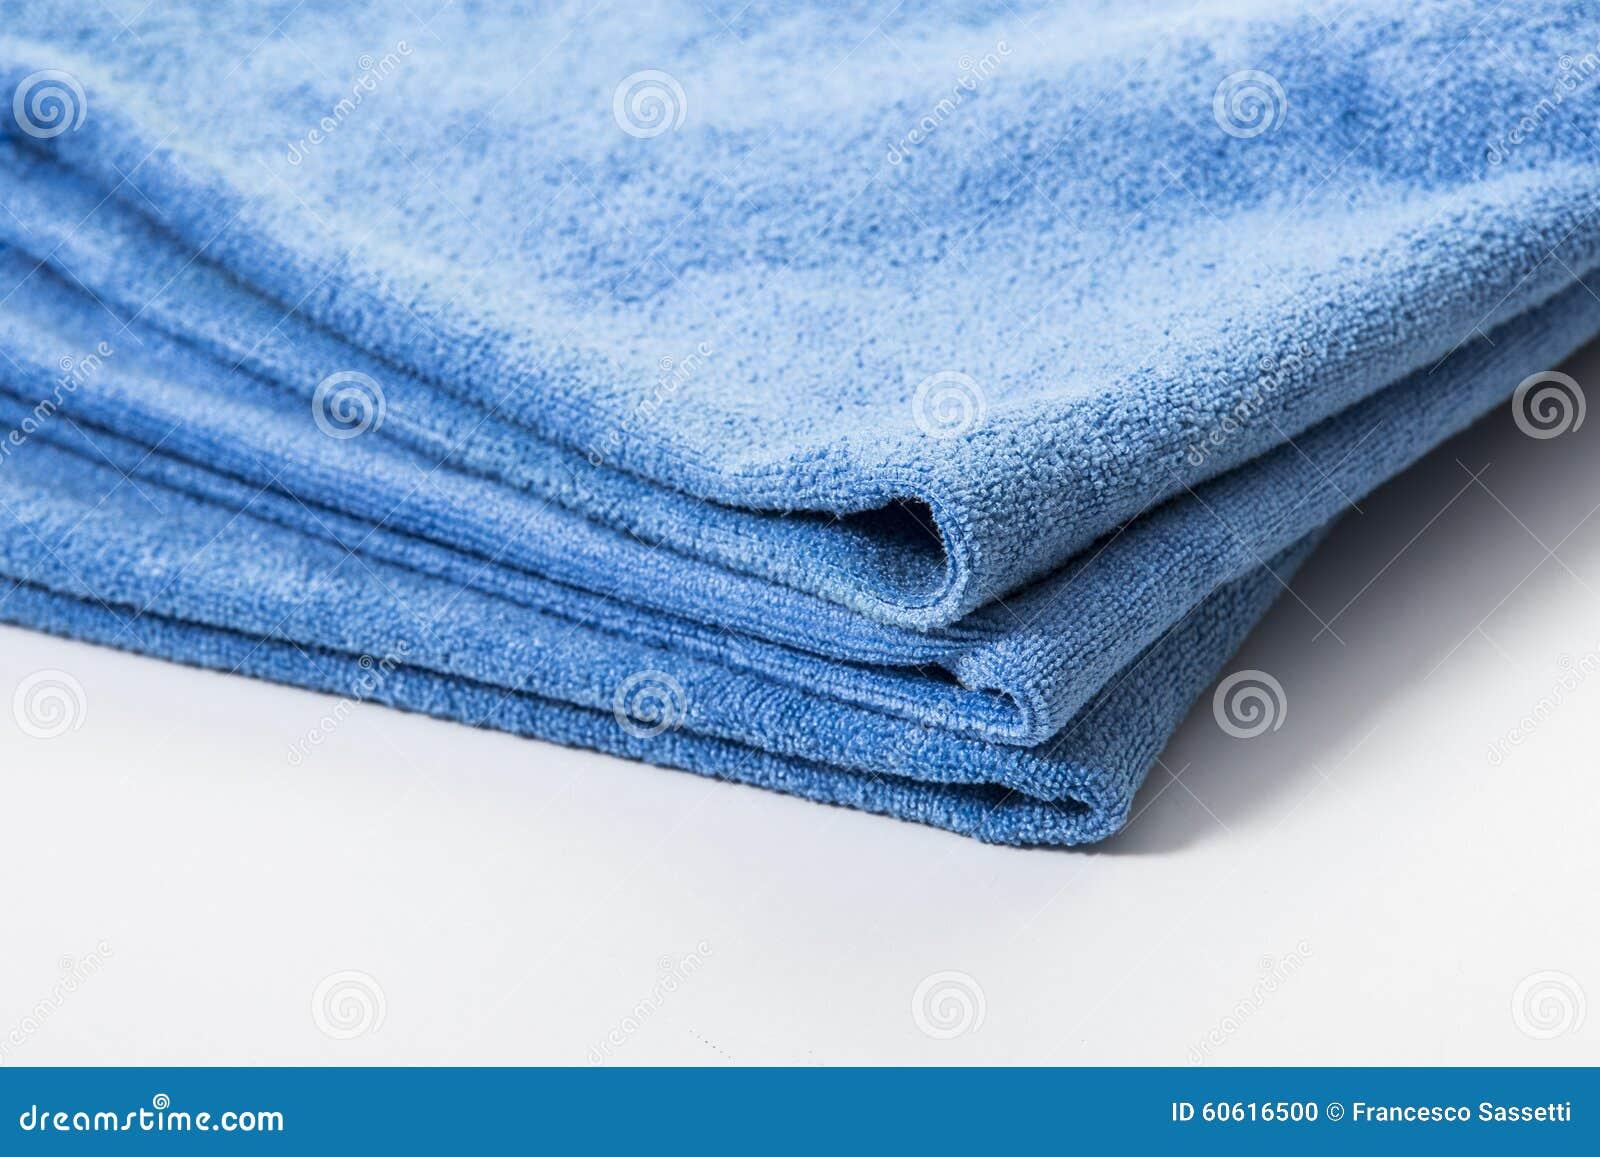 microfiber towel for car wipe stock photo image 60616500. Black Bedroom Furniture Sets. Home Design Ideas